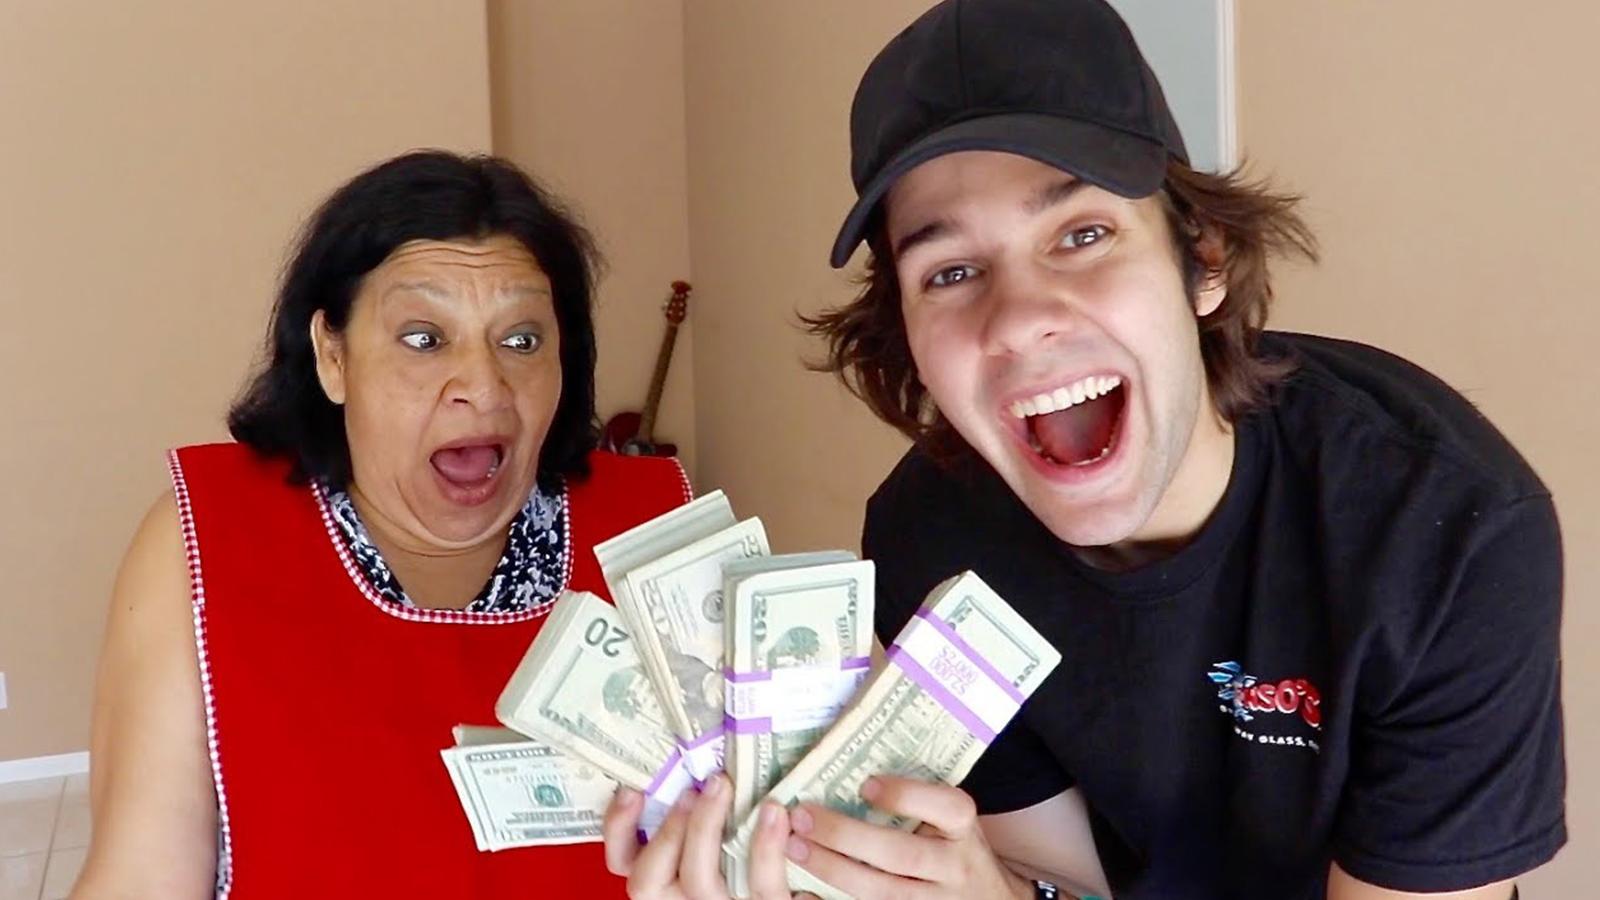 David Dobrik with money